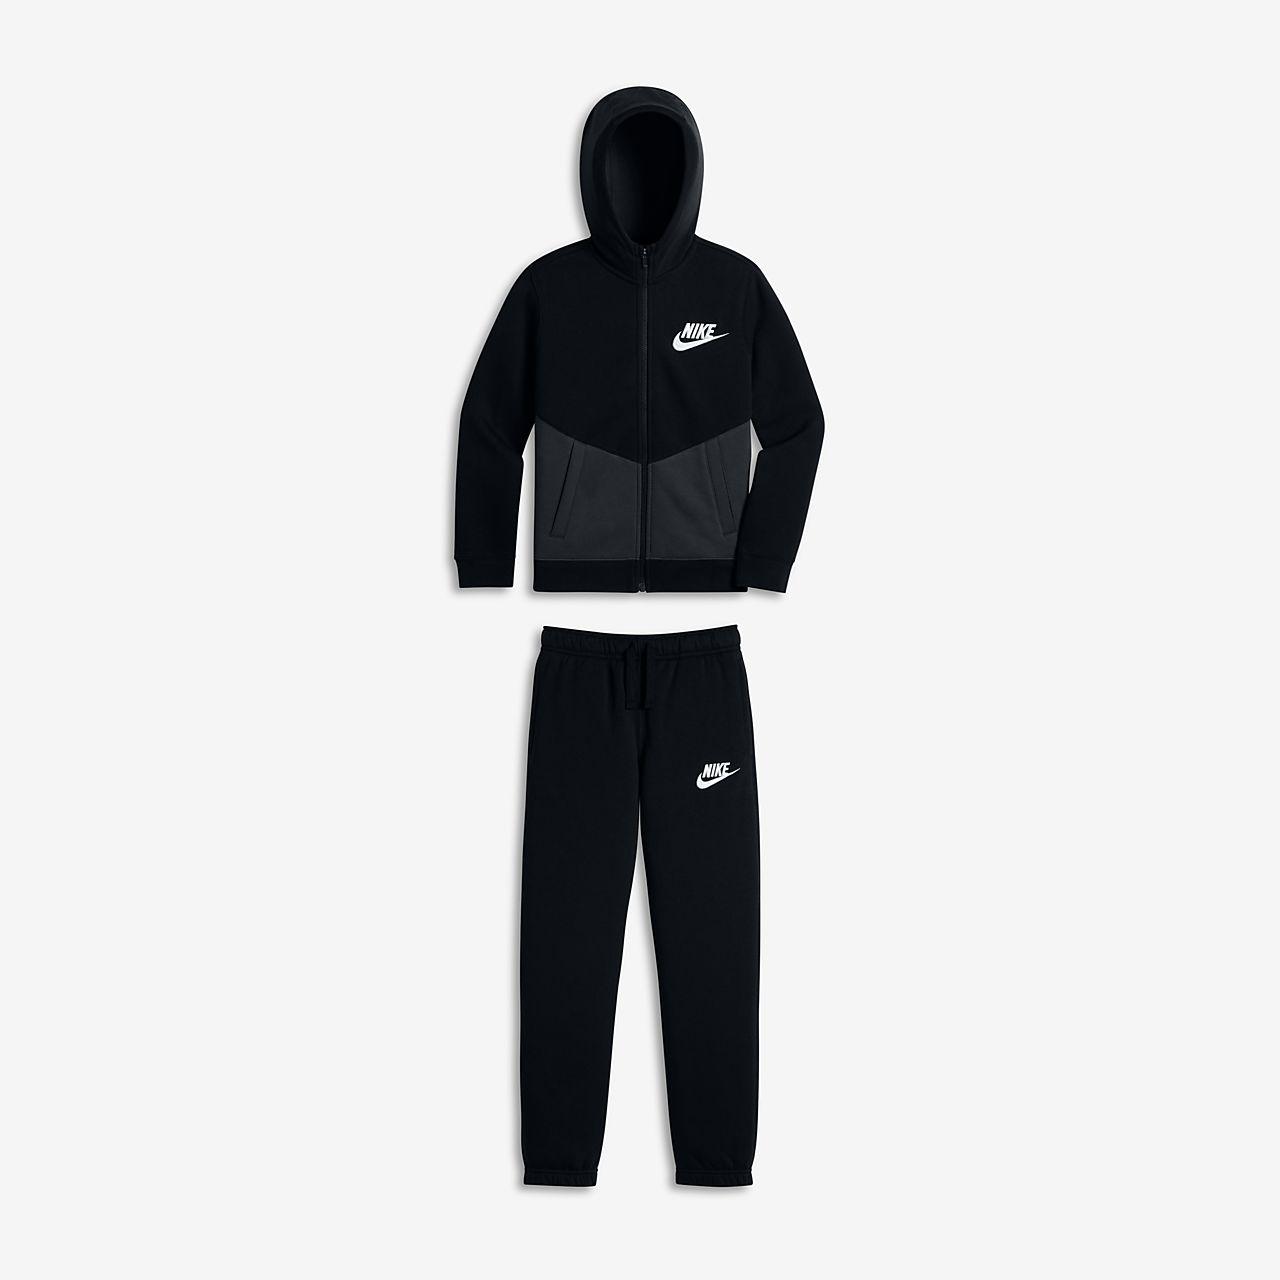 4eb88bd23dde Nike Sportswear Two-Piece Older Kids  (Boys ) Track Suit. Nike.com CA